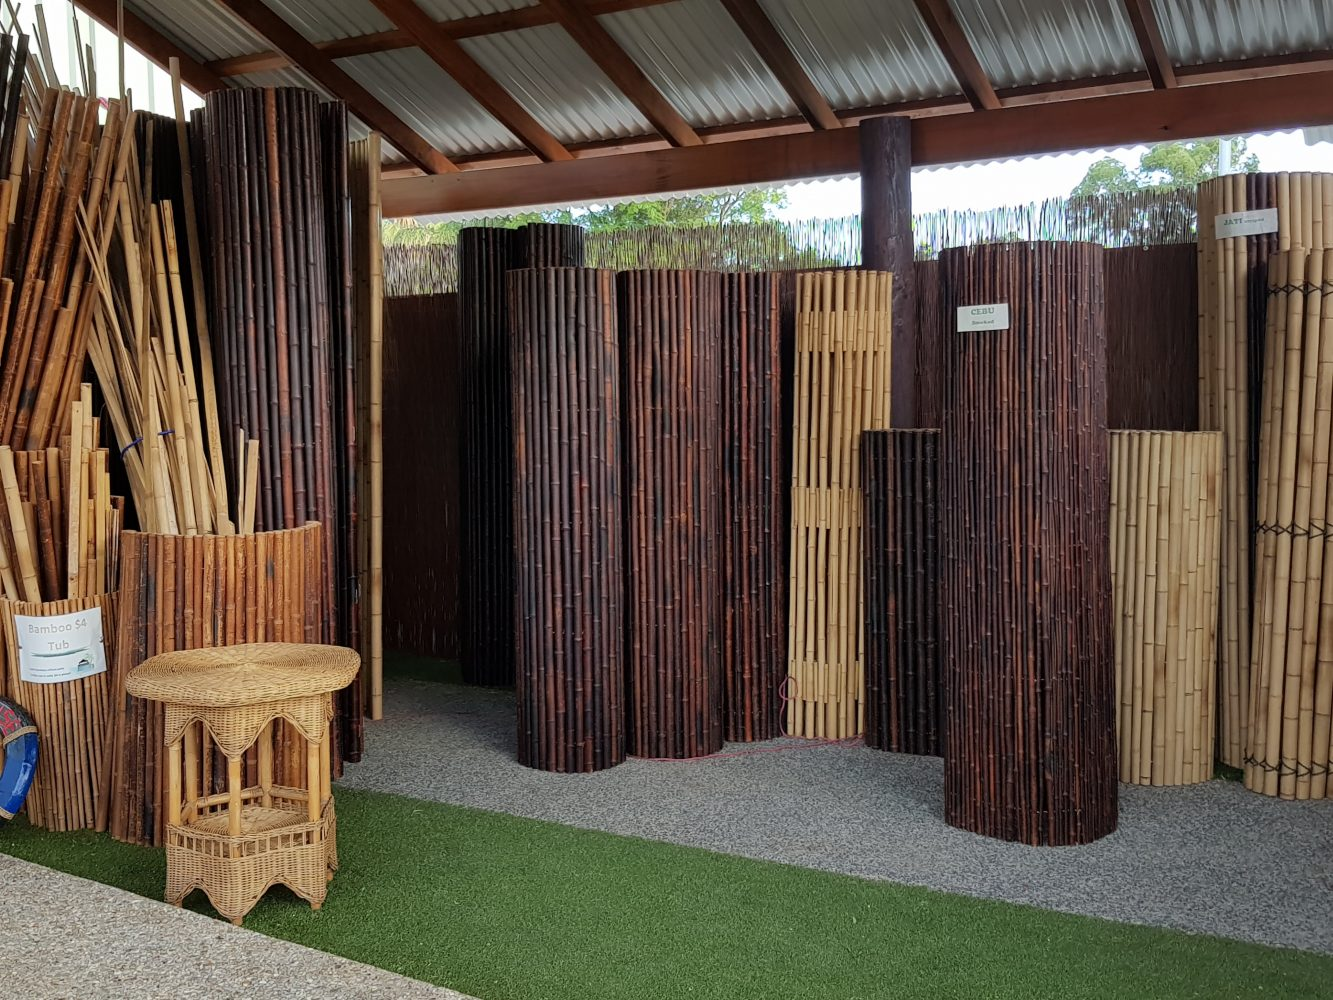 Bamboo Screens Structures Huts Decks Wa